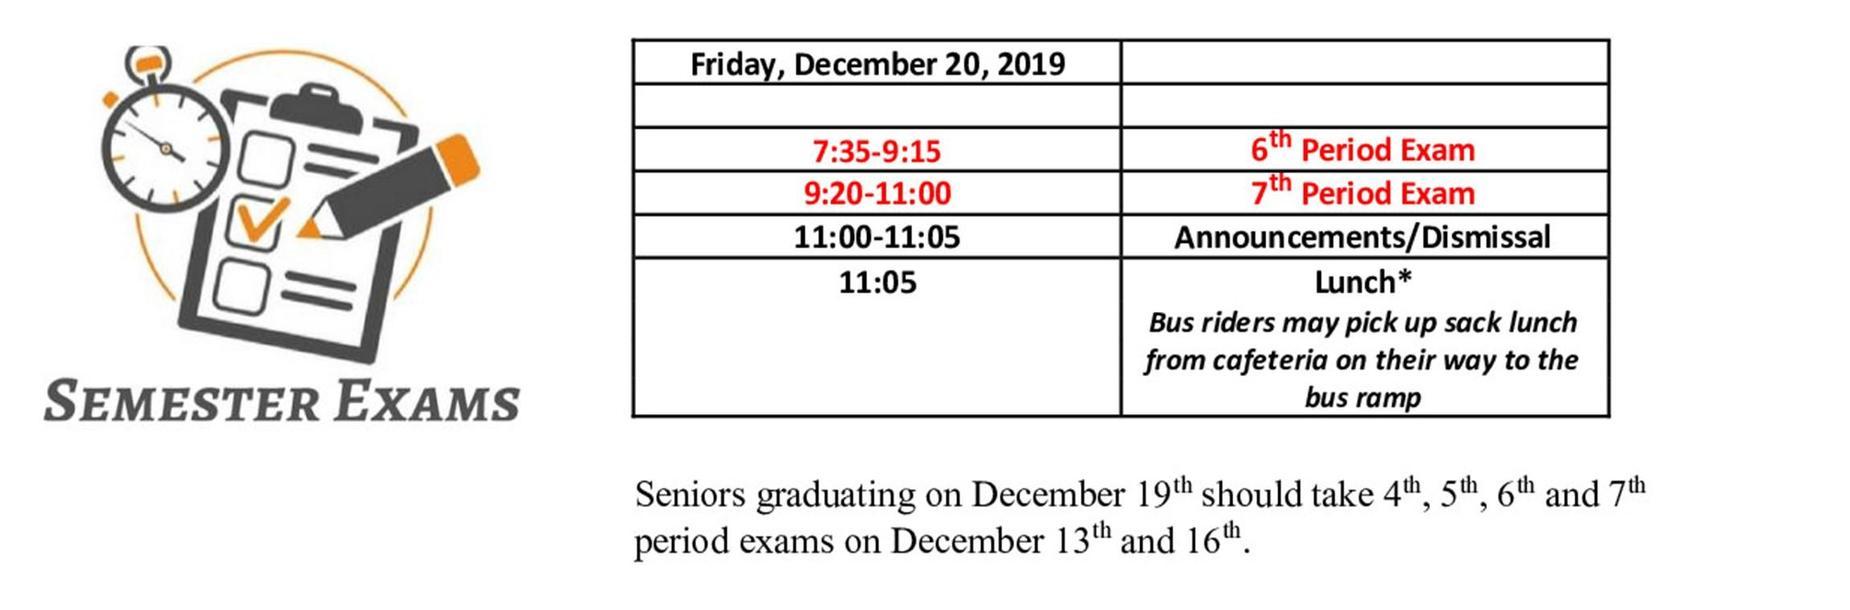 Friday Exam Schedule